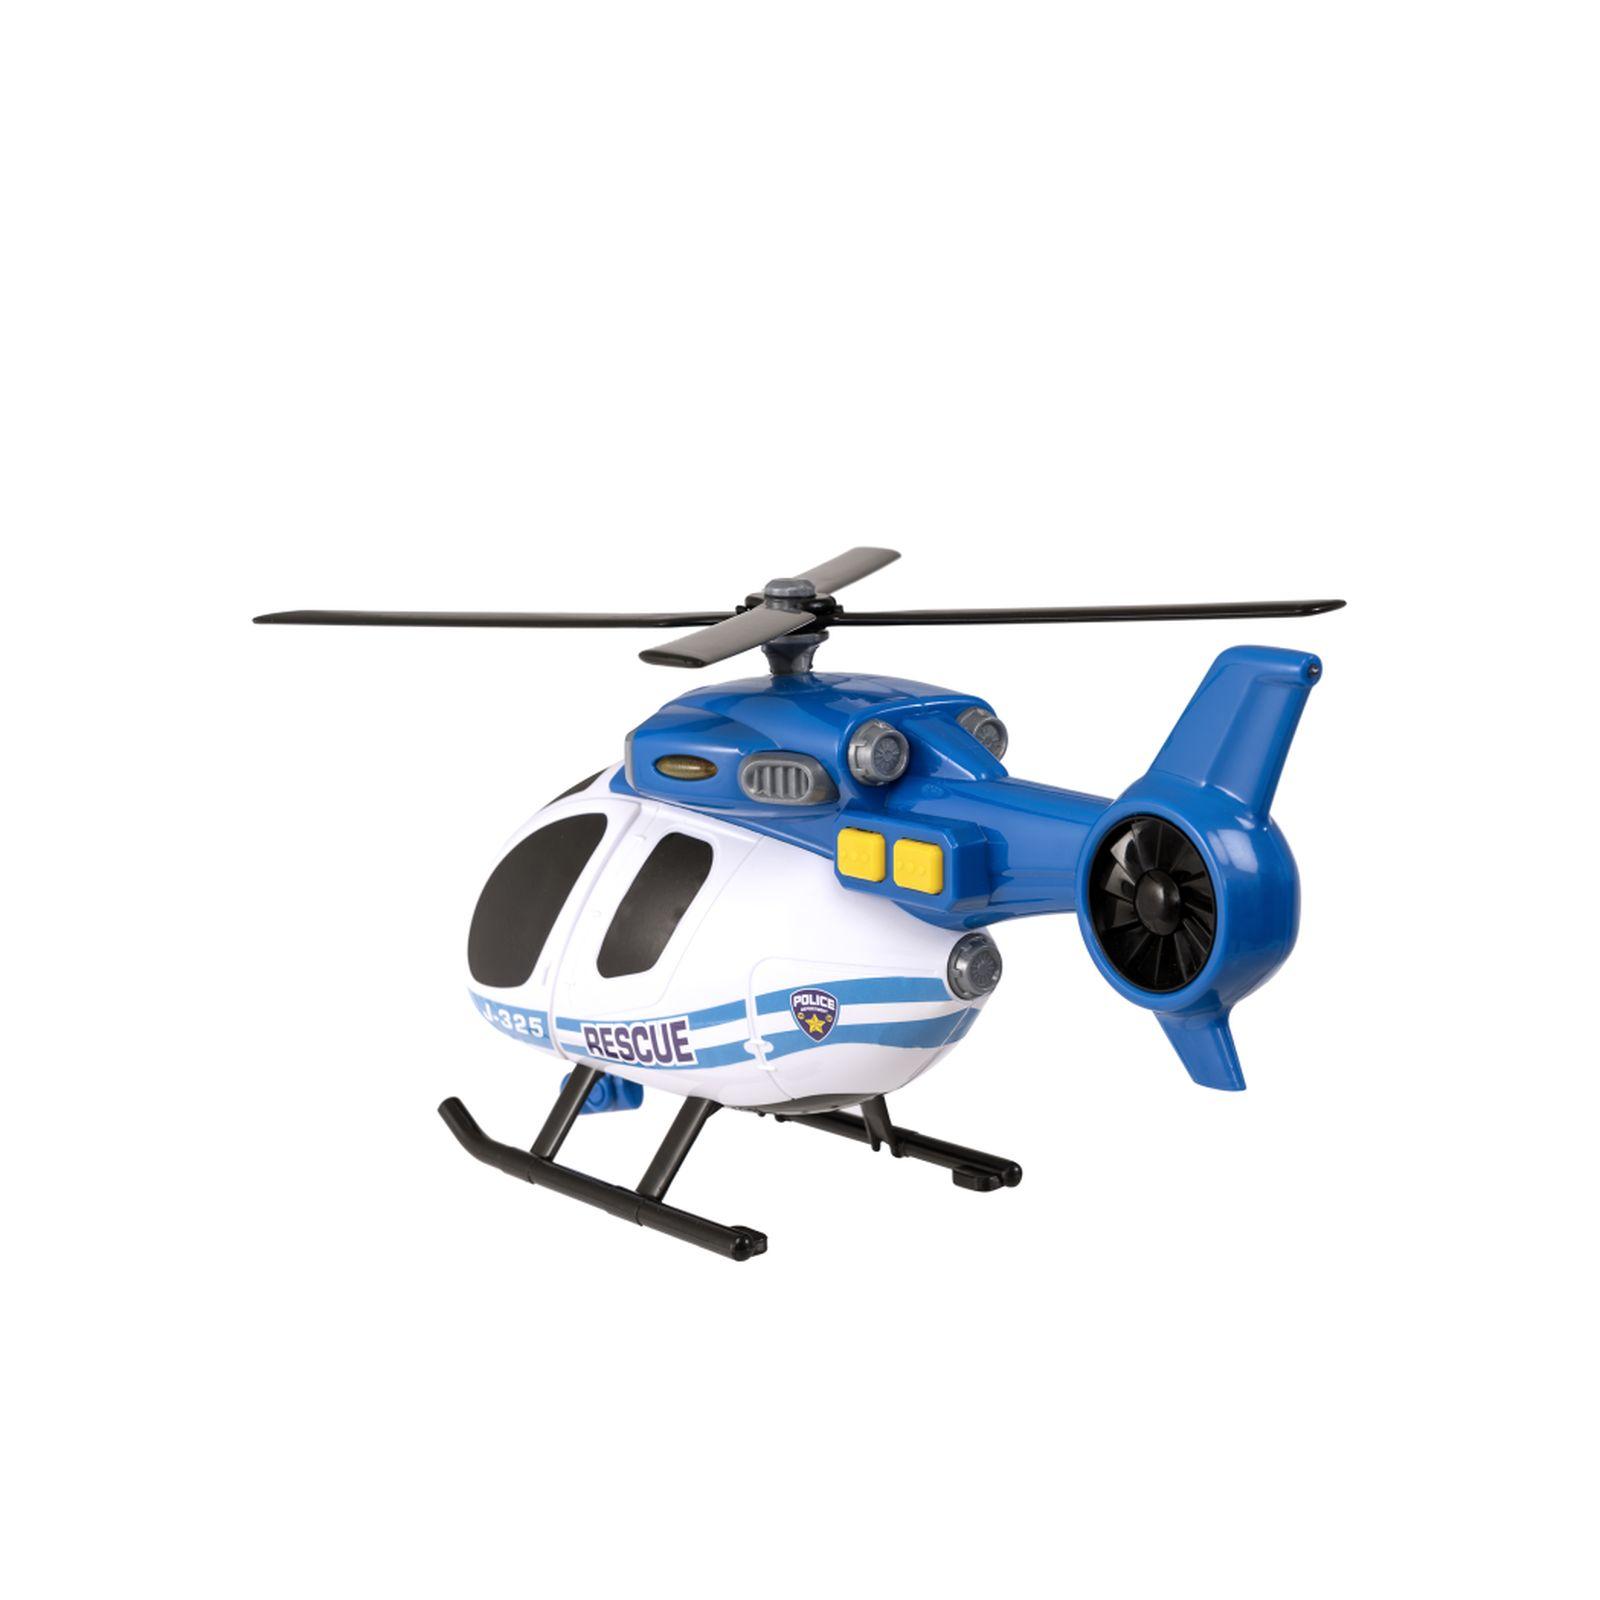 Elicottero urban copter - MOTOR & CO.